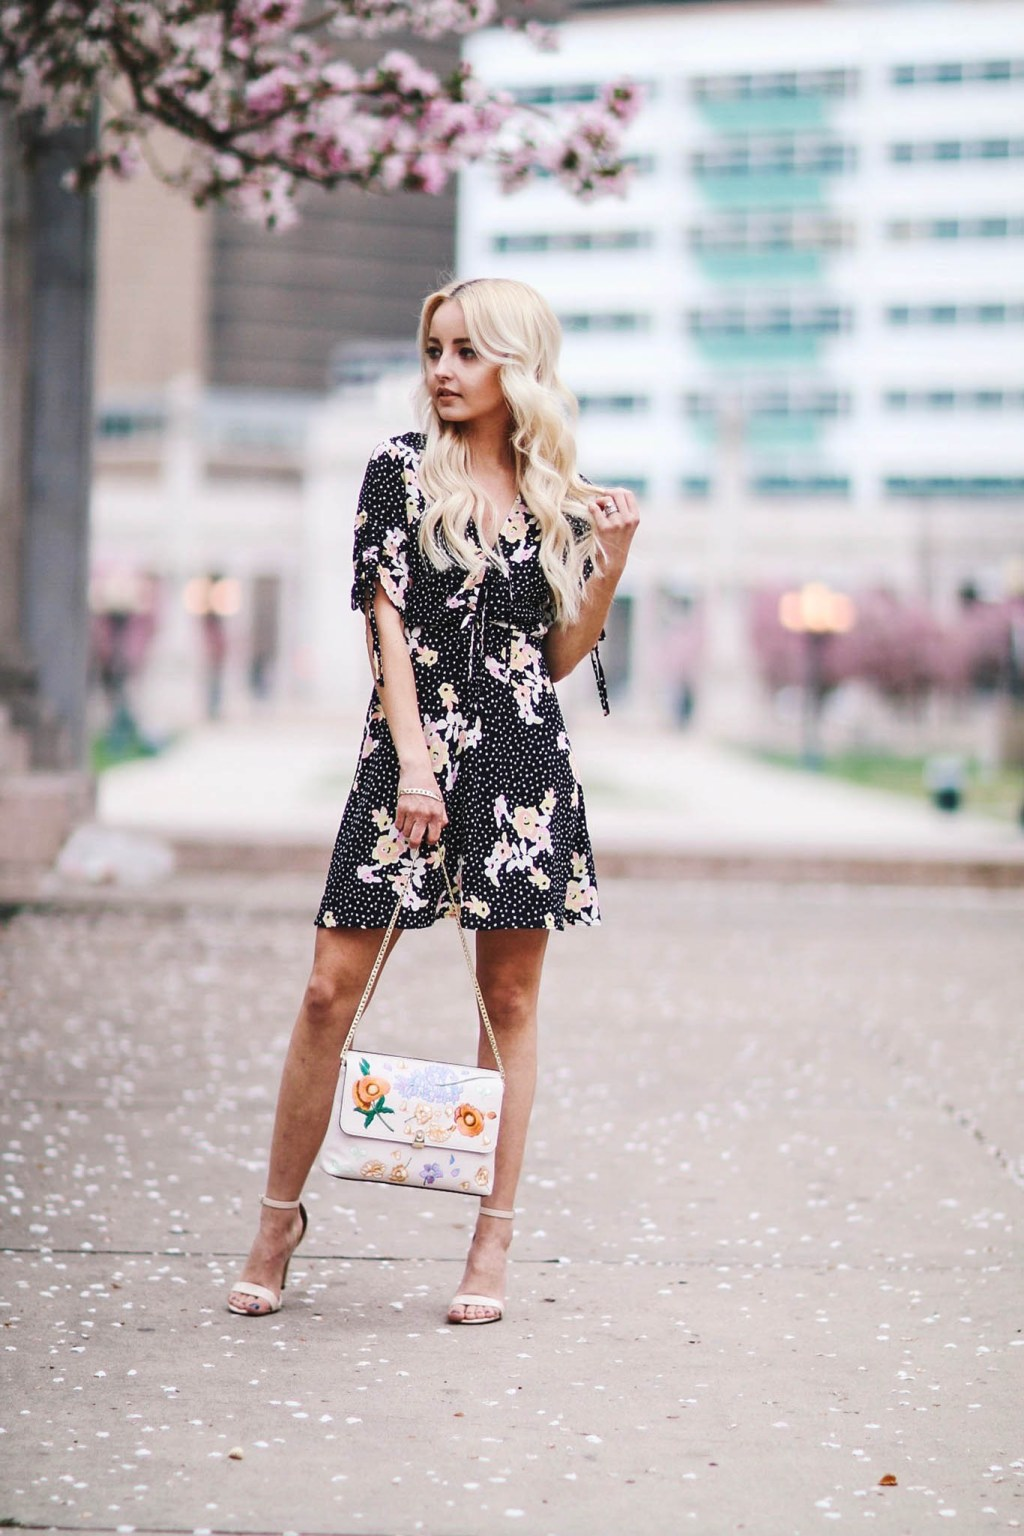 Alena Gidenko of modaprints.com styles a floral TopShop dress for Spring